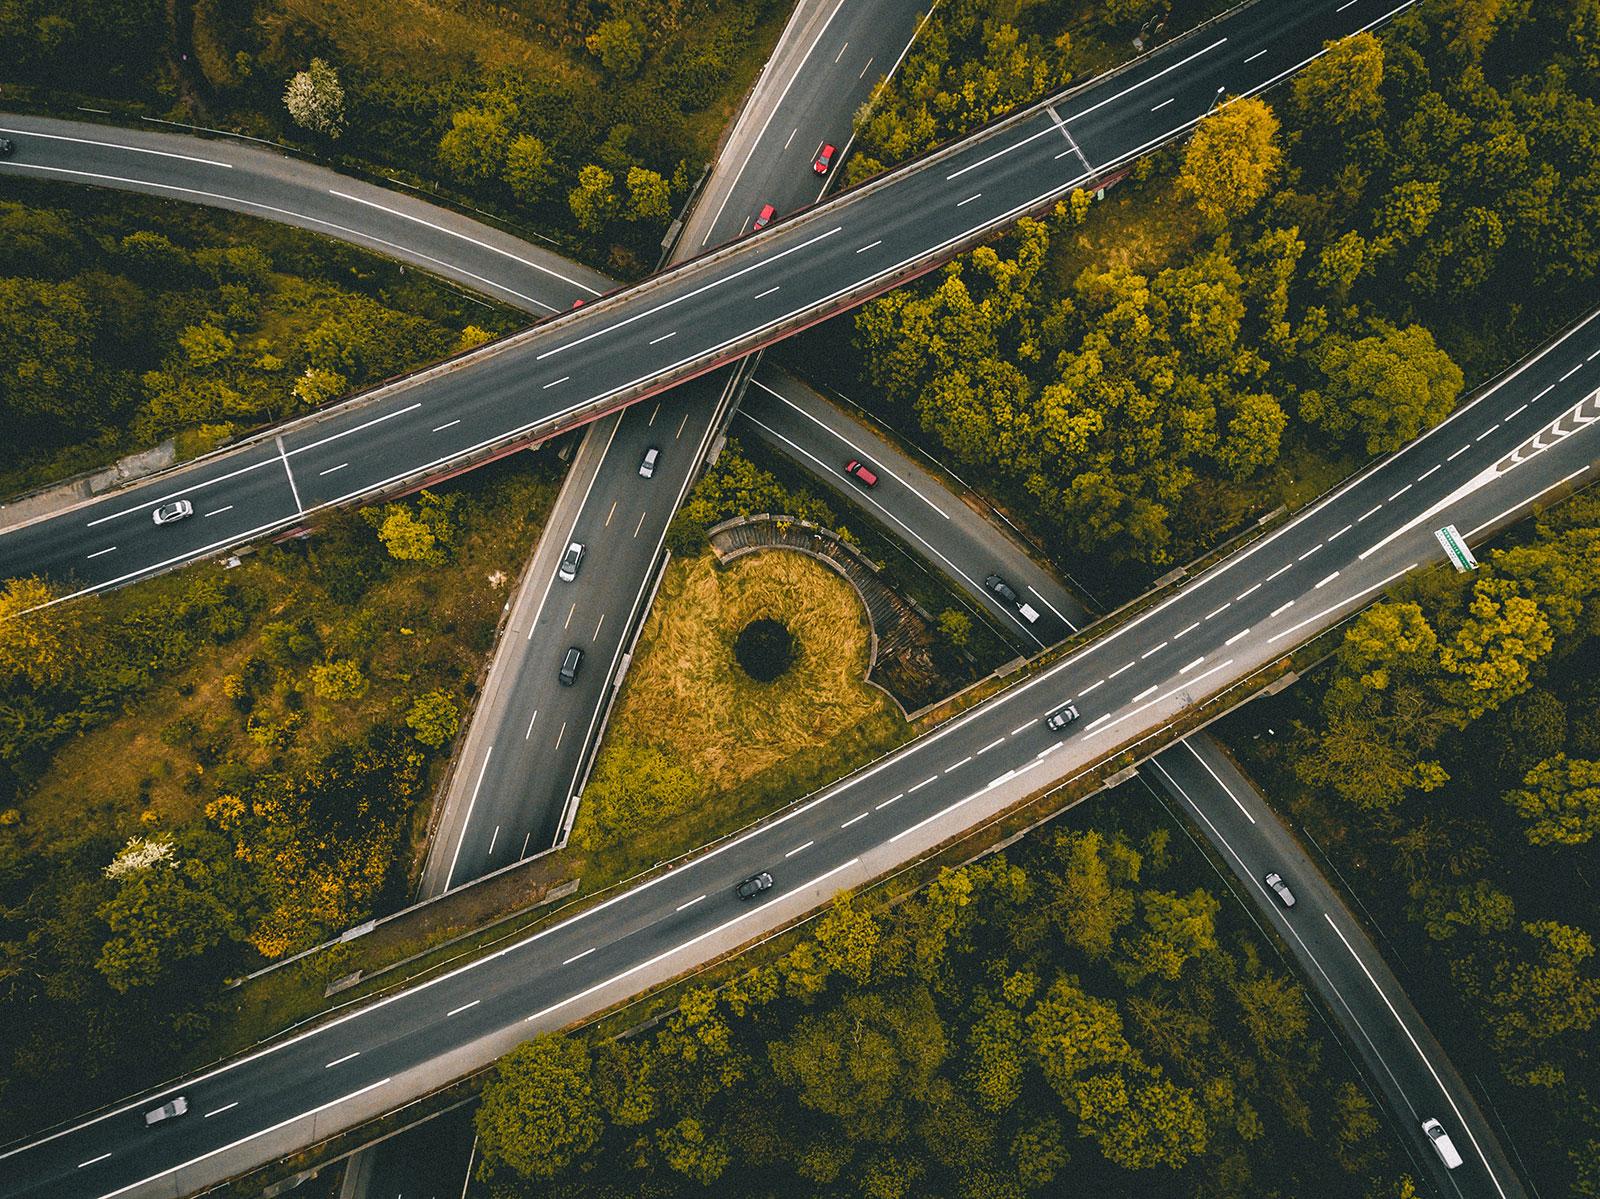 Sommerens Prisøkninger I Transportbransjen